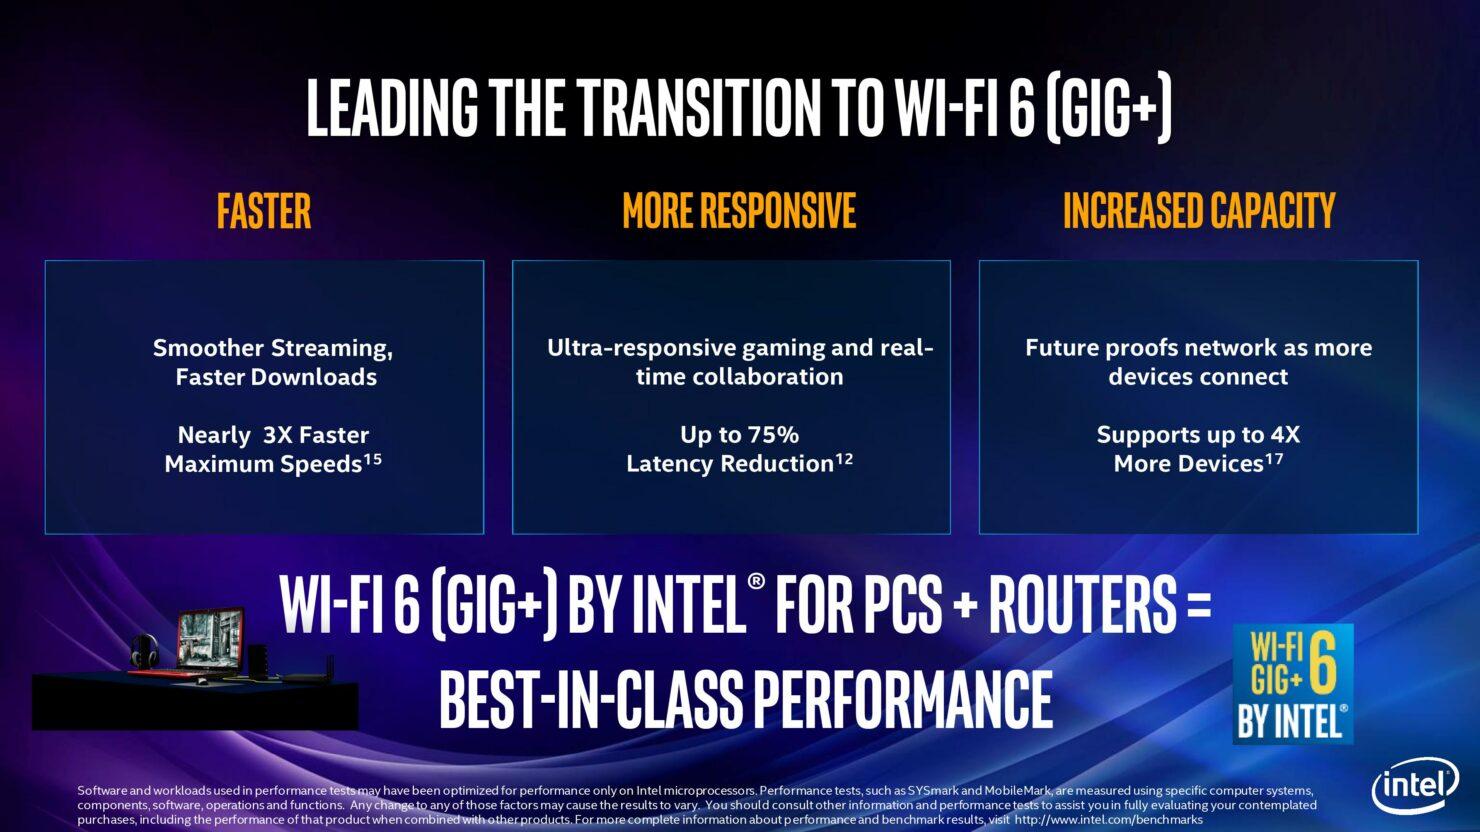 9th-gen-intel-core-mobile-launch-presentation-under-nda-until-april-23-page-012